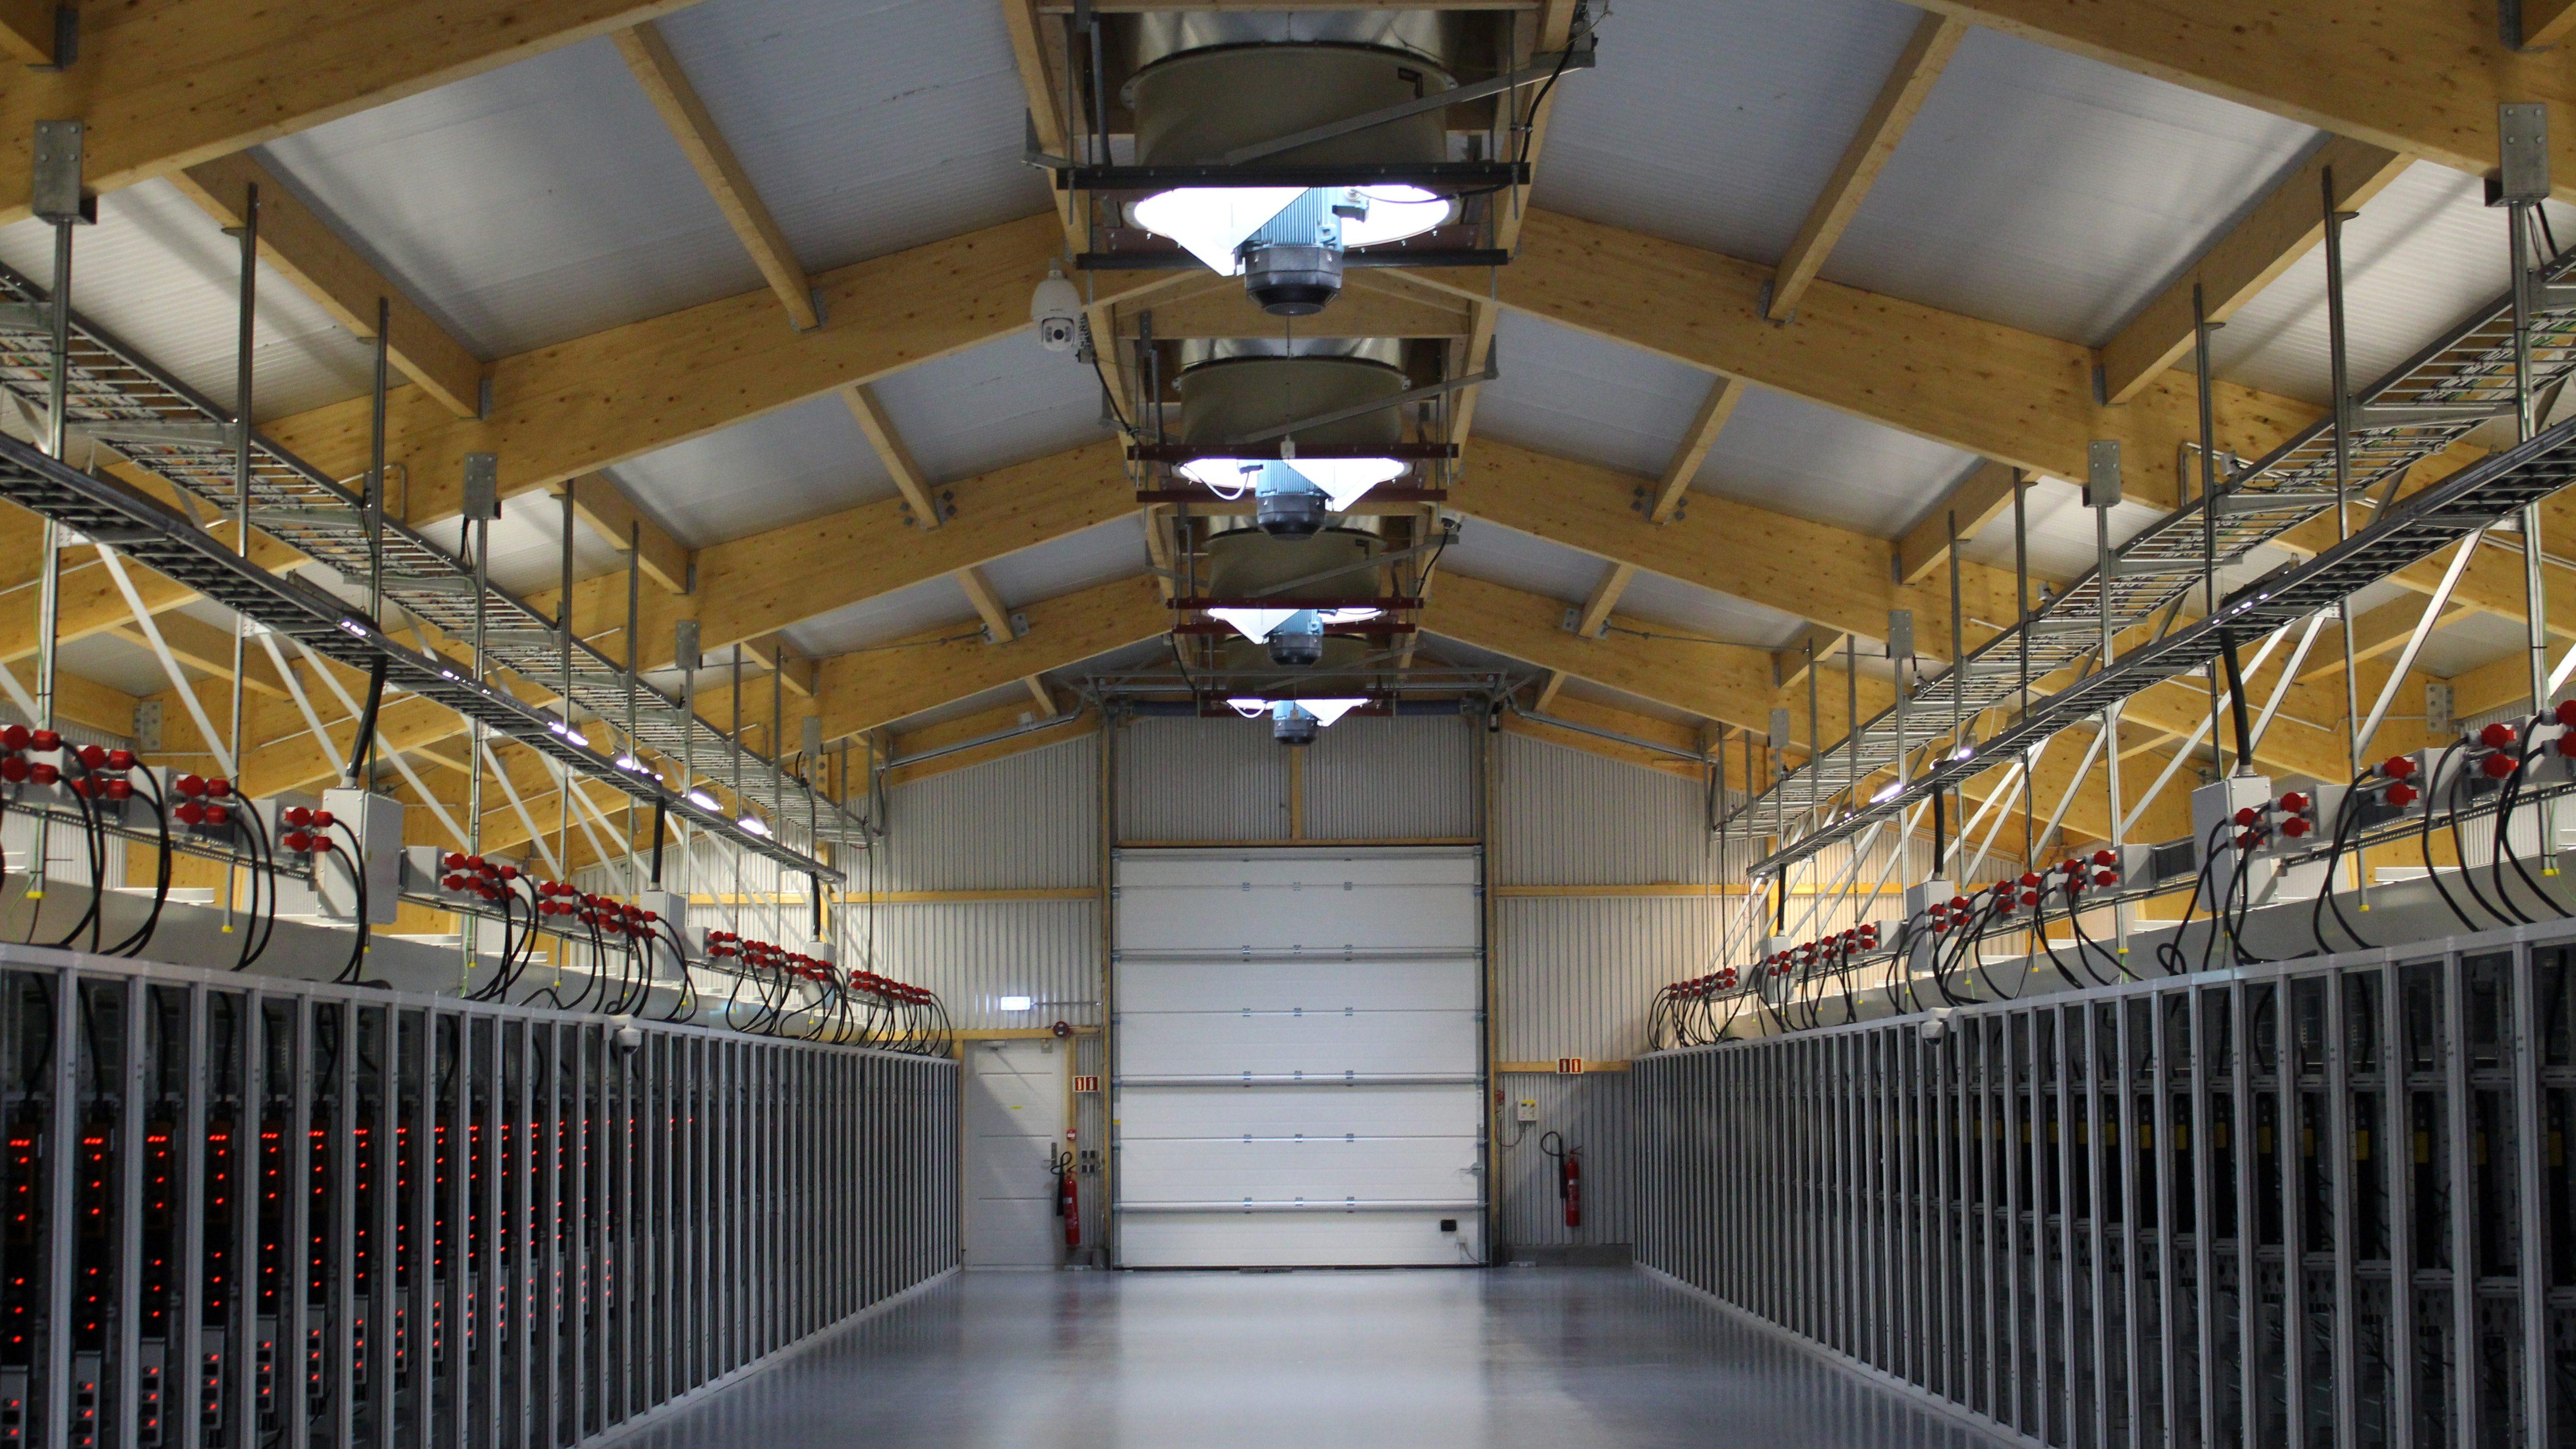 An interior view of U.S. bitcoin mining company Bitfury's mining farm near Keflavik, Iceland, June 7, 2016. Picture taken June 7, 2016.